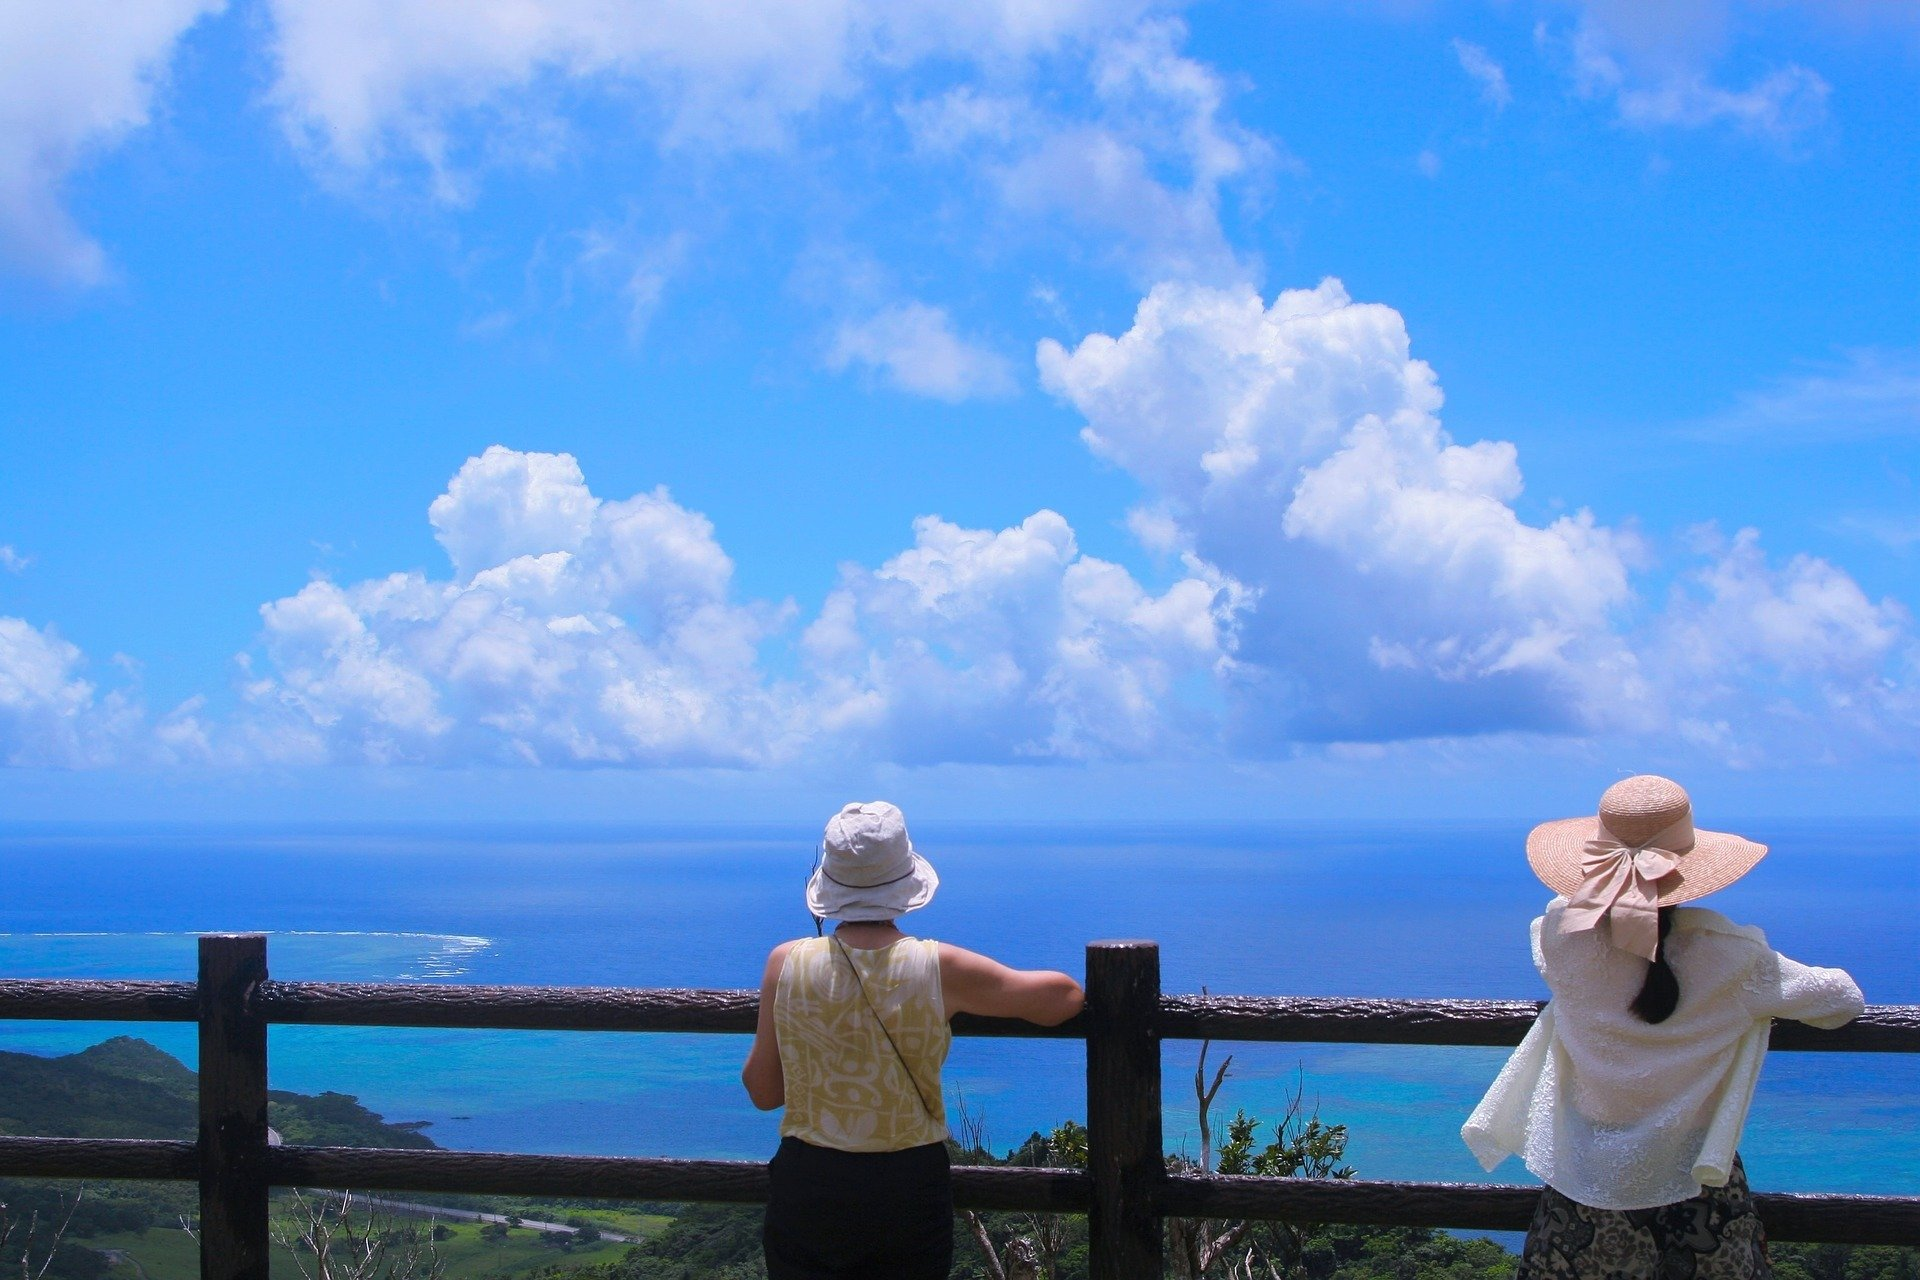 Ishigaki, Okinawa